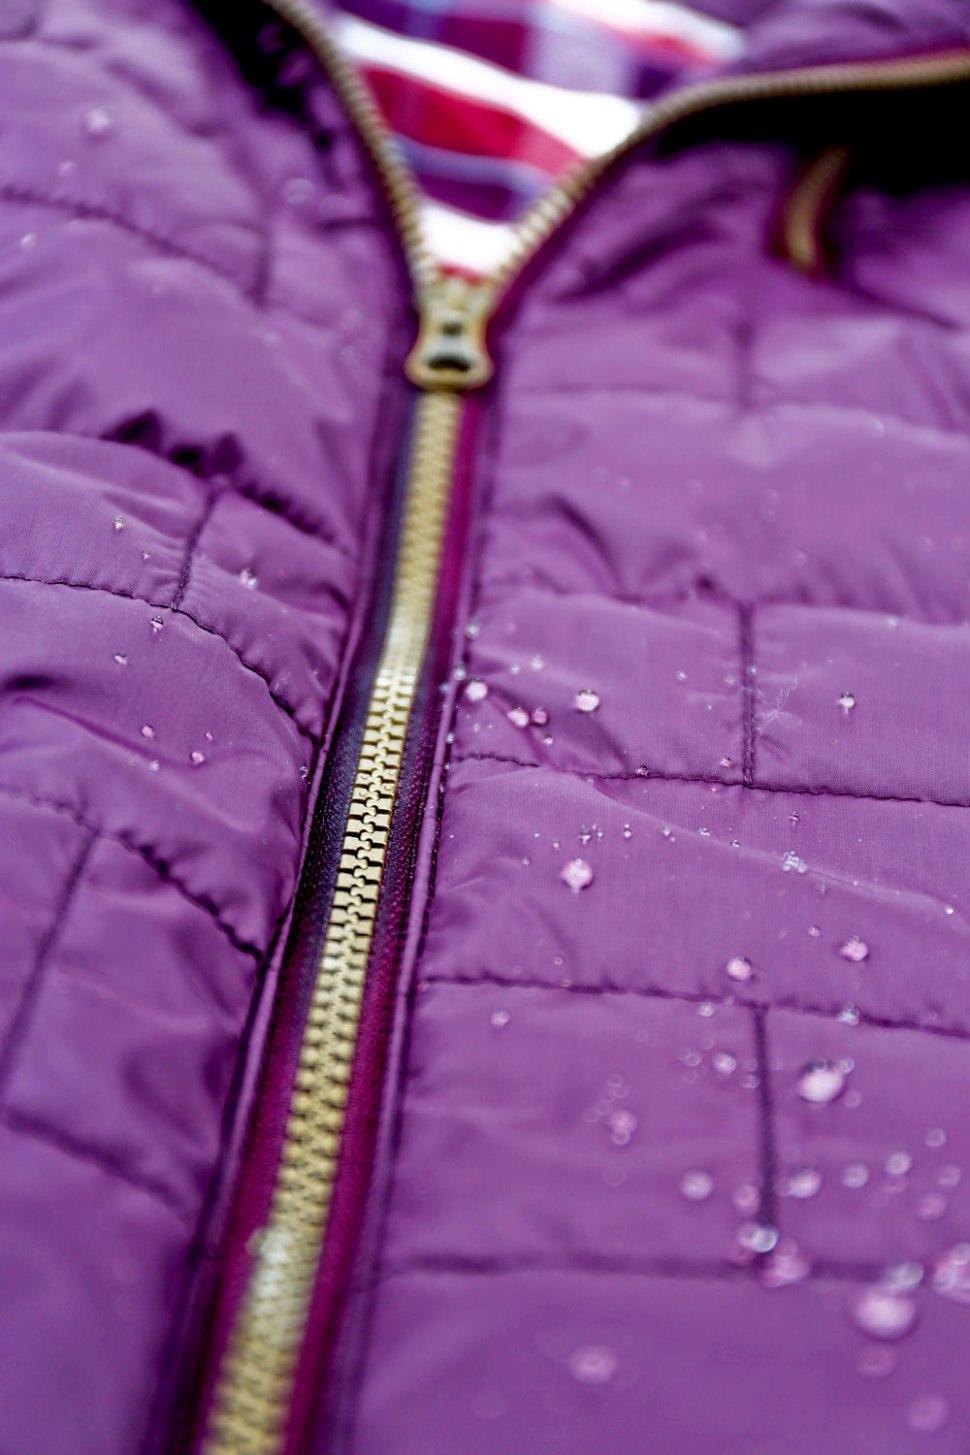 DIY Rain Chain / Crafted in Carhartt